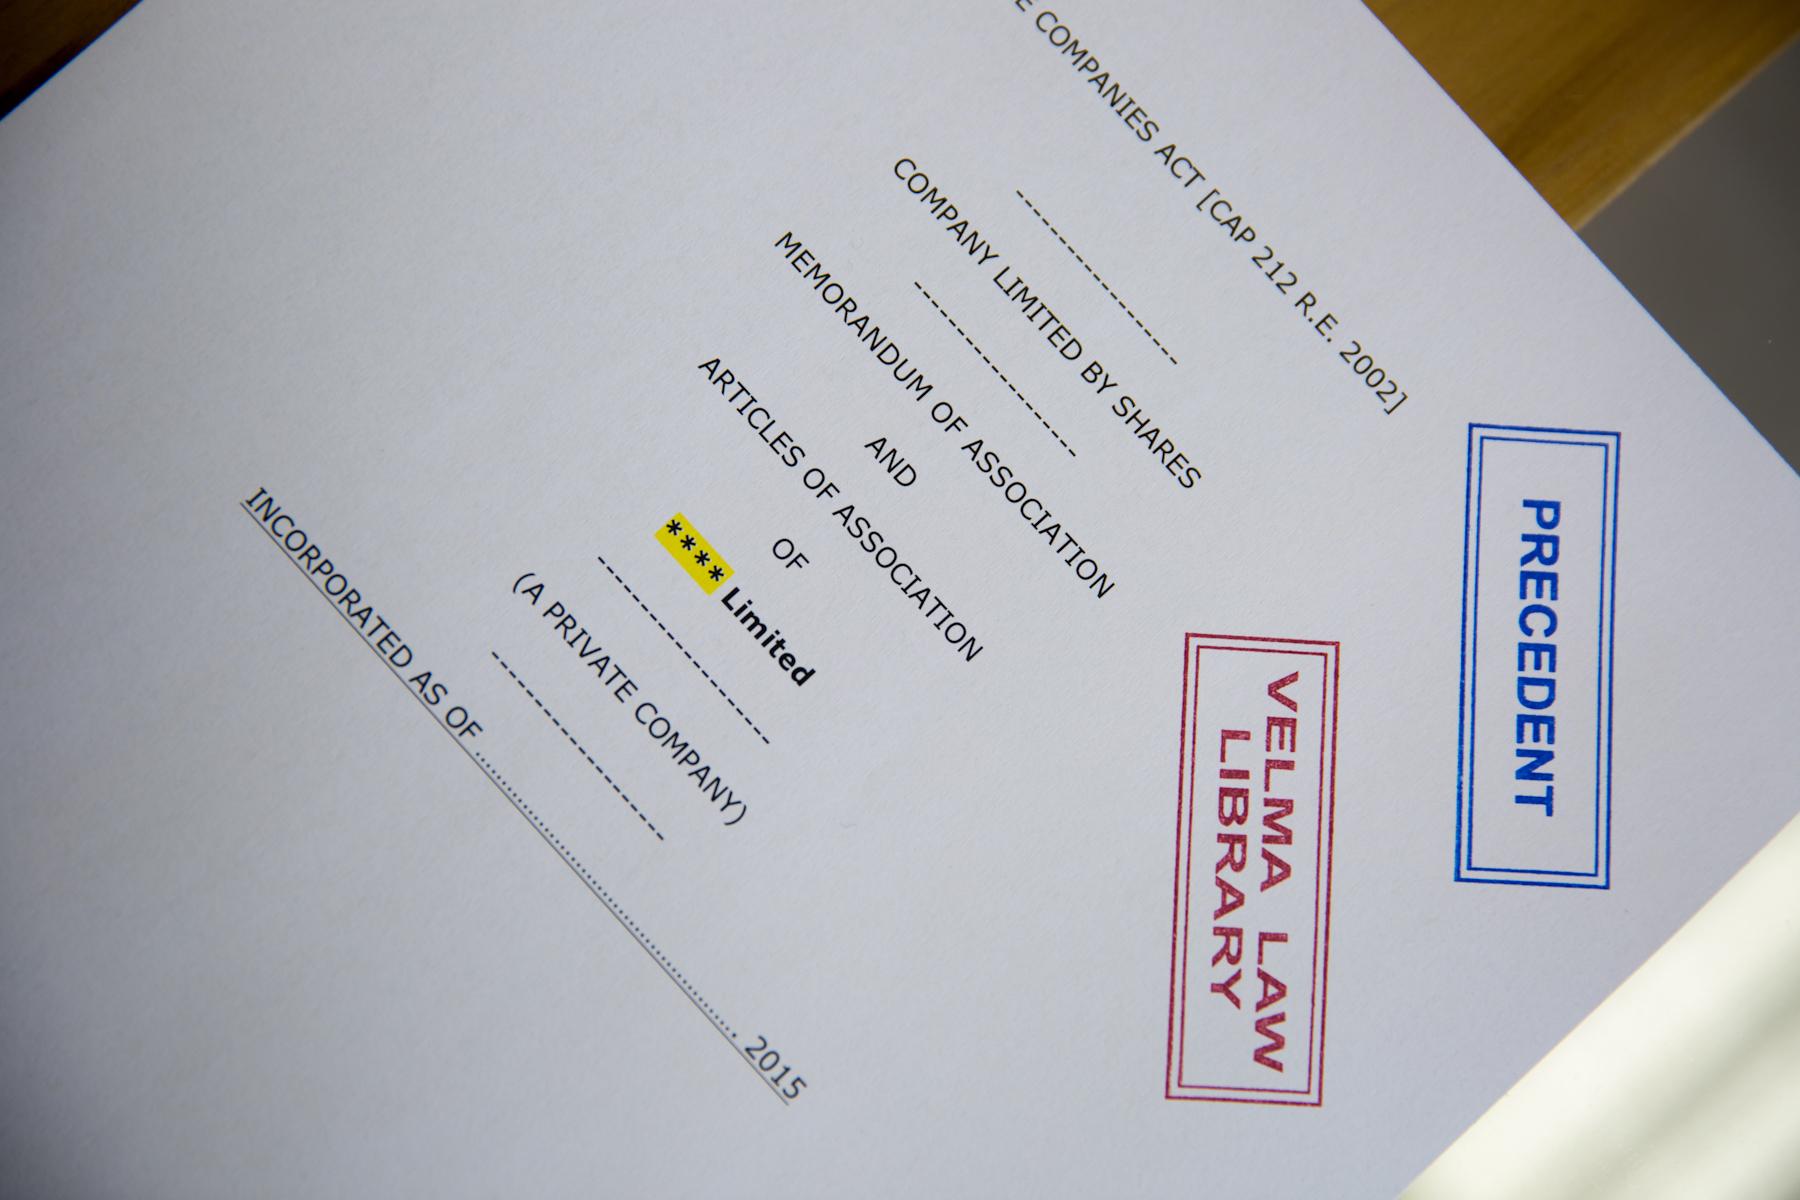 velma-law-tanzania-sala-lewis-verve-225